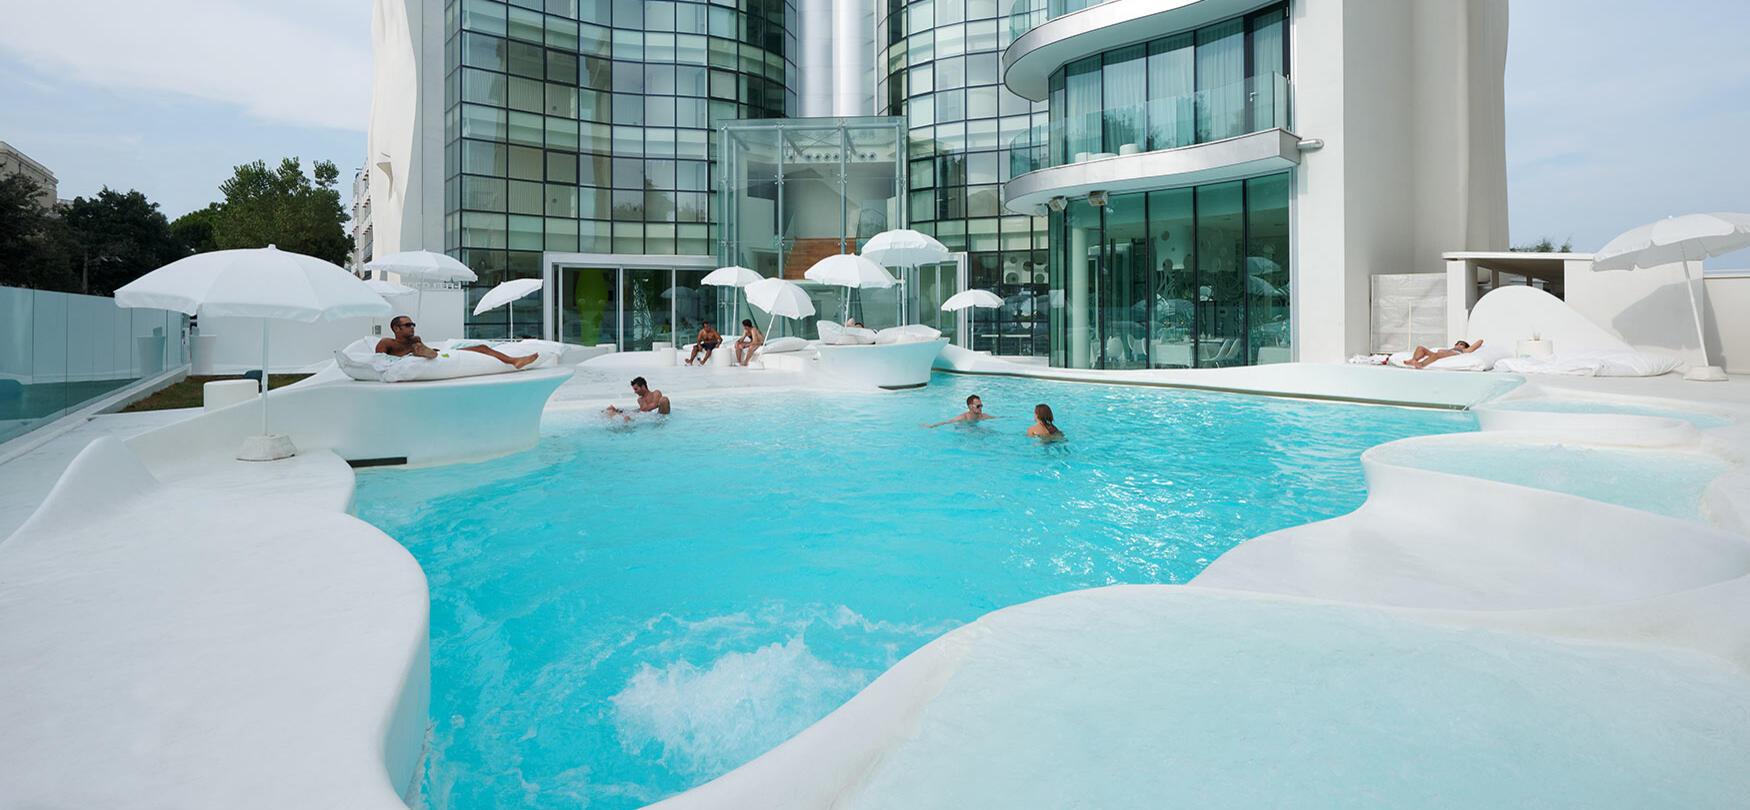 ambienthotels it hotel-centro-benessere-rimini 009